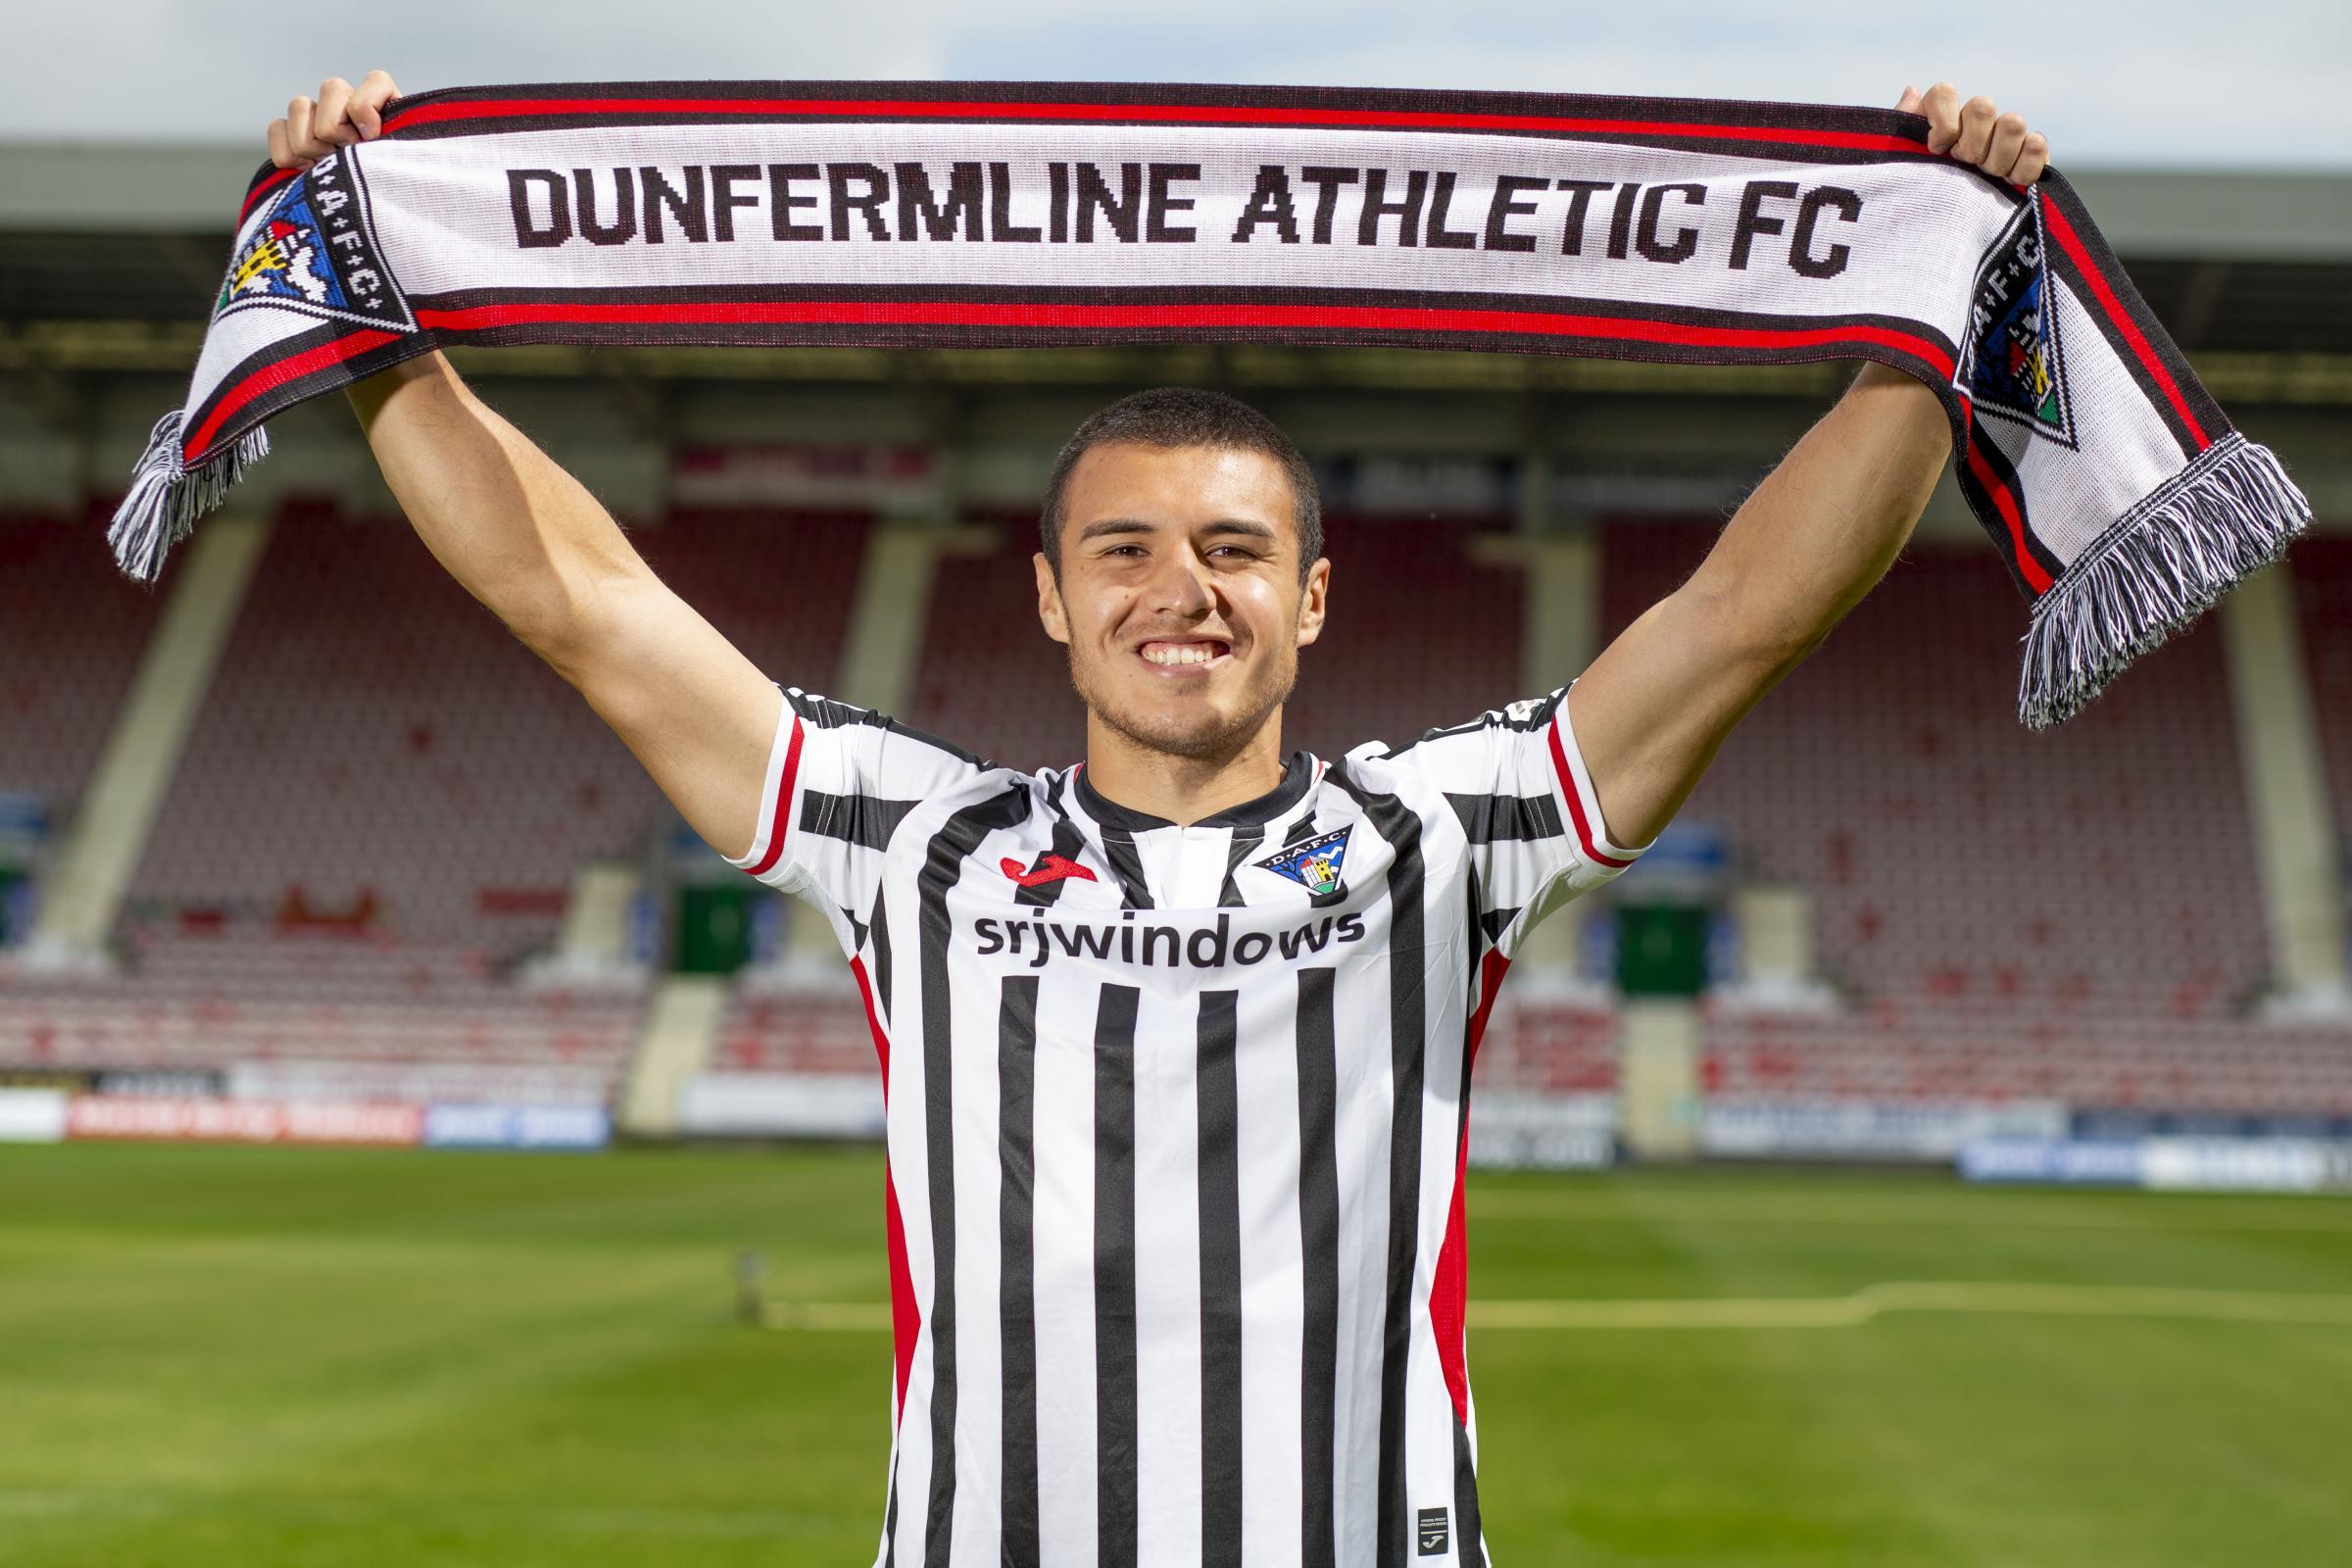 Dunfermline: Former Hearts defender Leon Jones signs